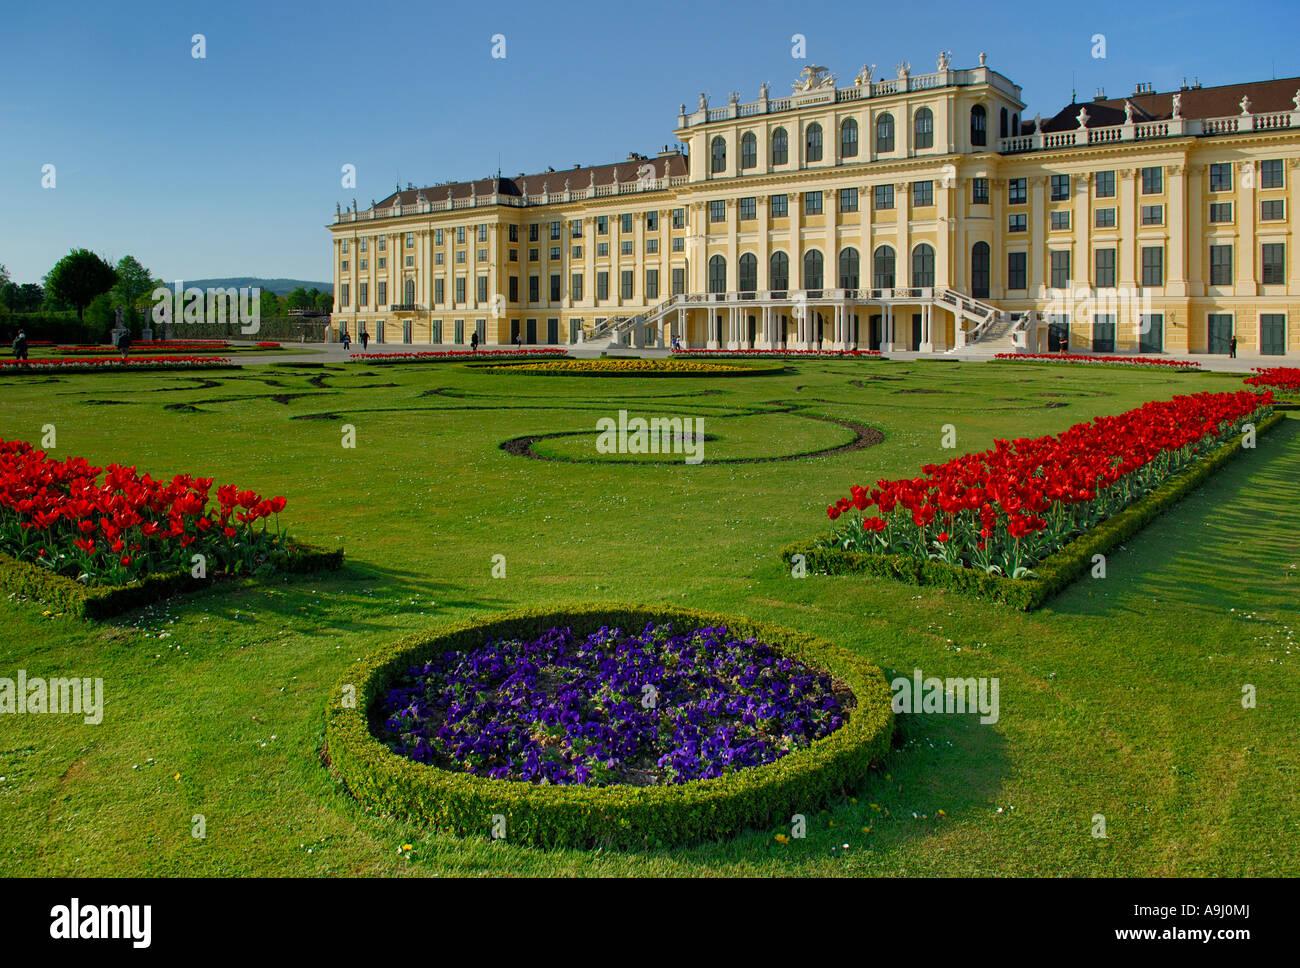 Schoenbrunn Palace, Vienna, Vienna, Austria Stock Photo